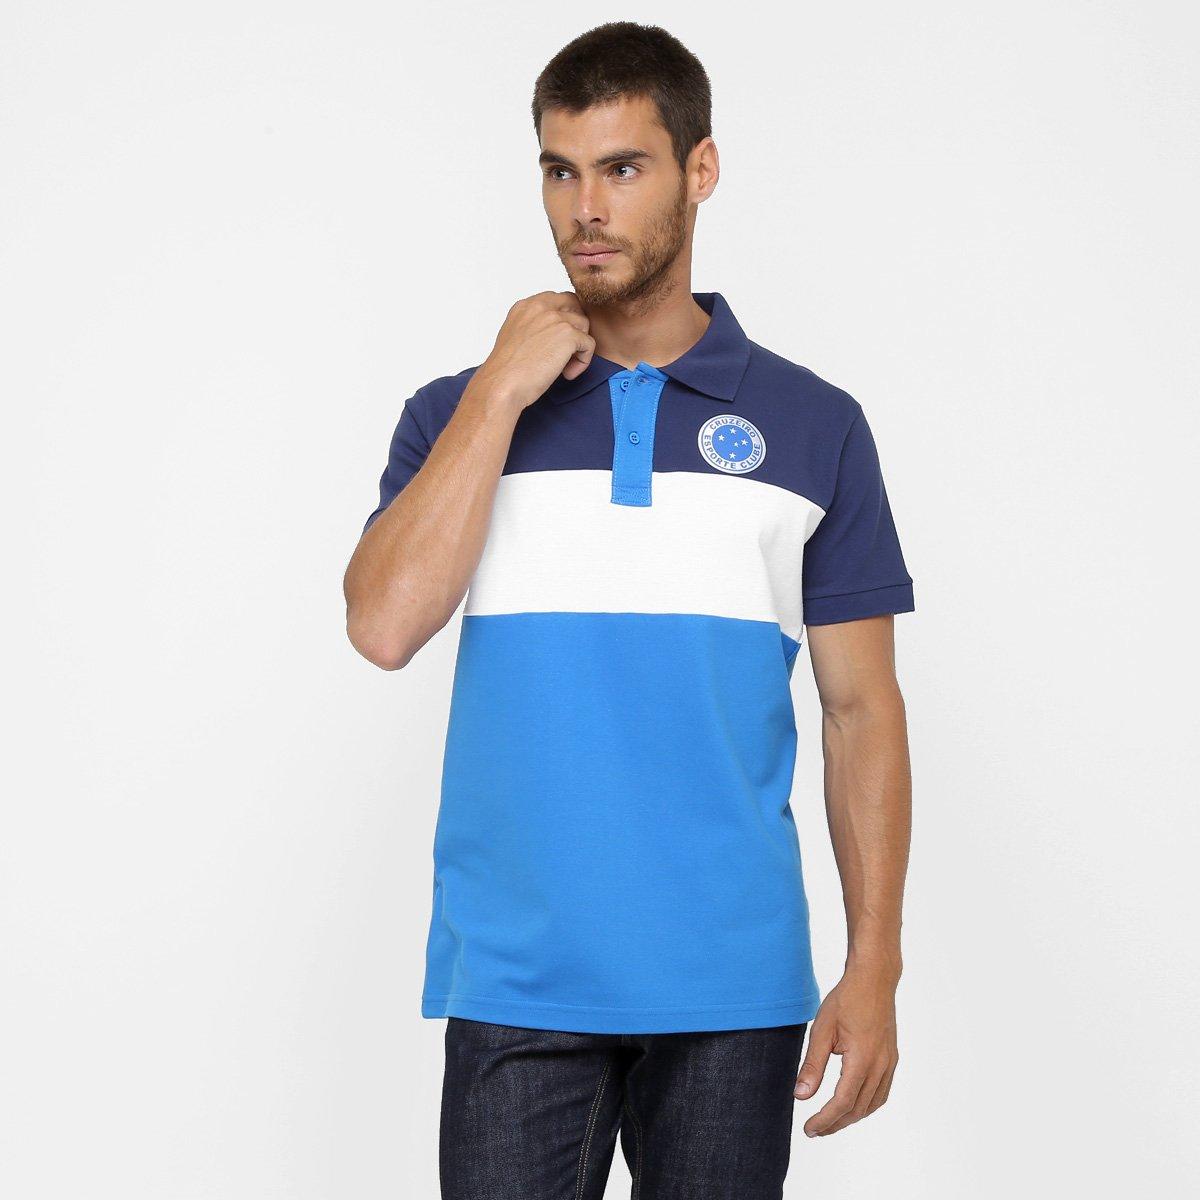 Camisa Polo Cruzeiro Philip Masculina - Compre Agora  9f1869b1bc37a